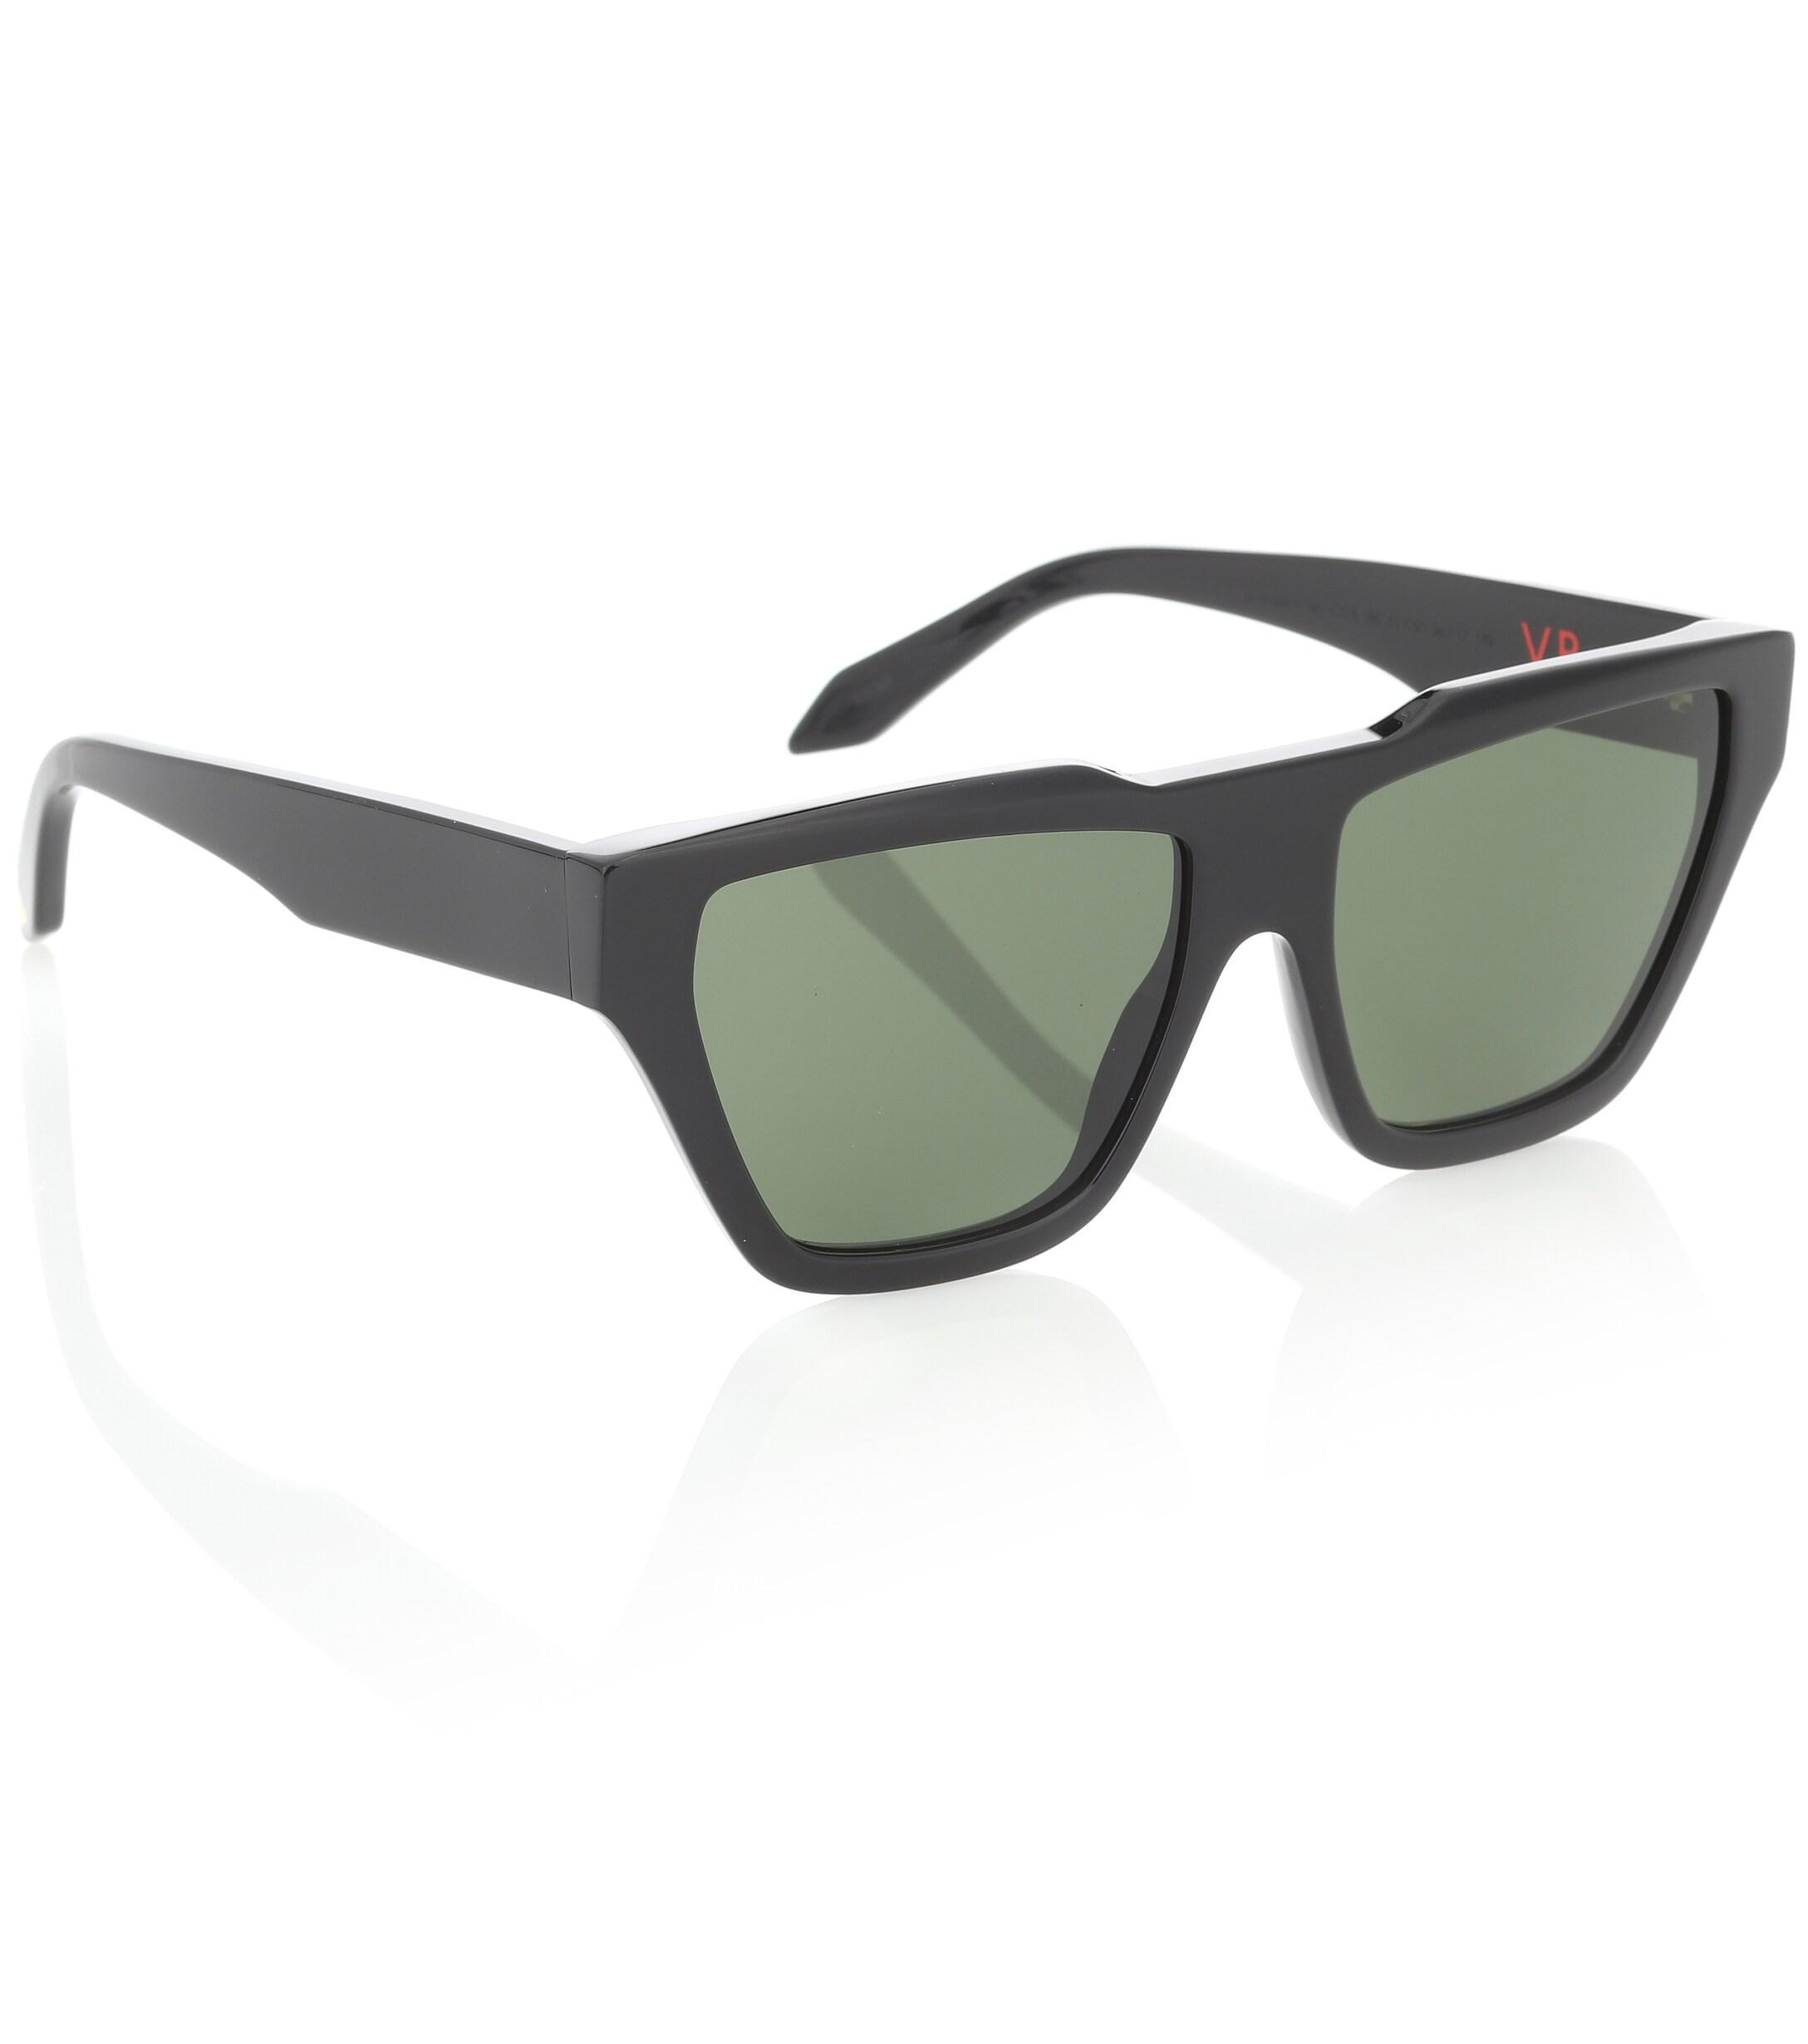 fed1875d30 Victoria Beckham Square Cat-eye Sunglasses in Black - Lyst